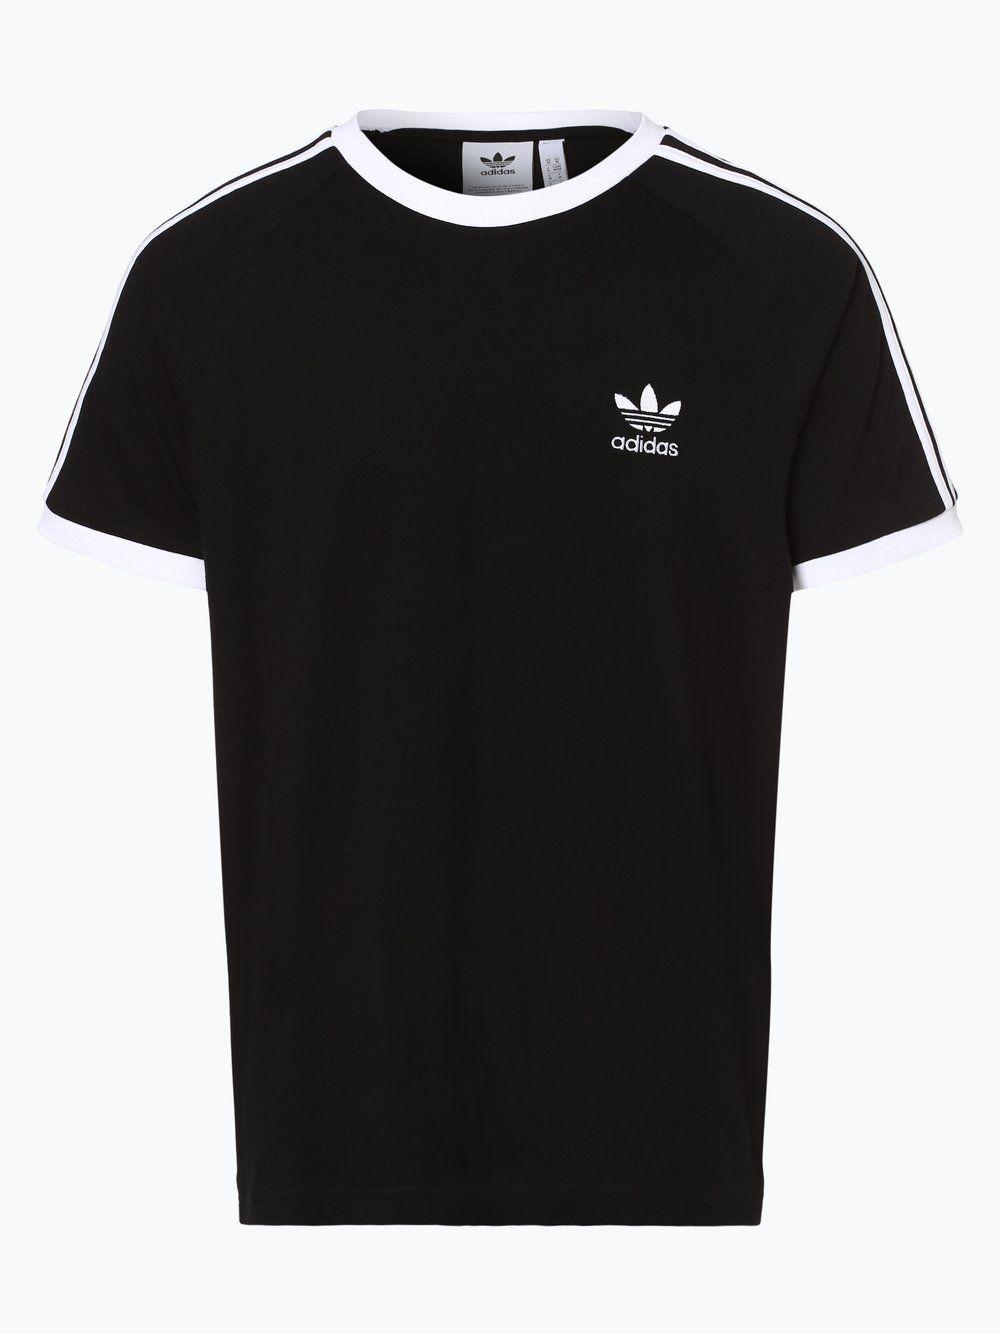 adidas Originals T Shirt schwarz | Adidas originals, Herren